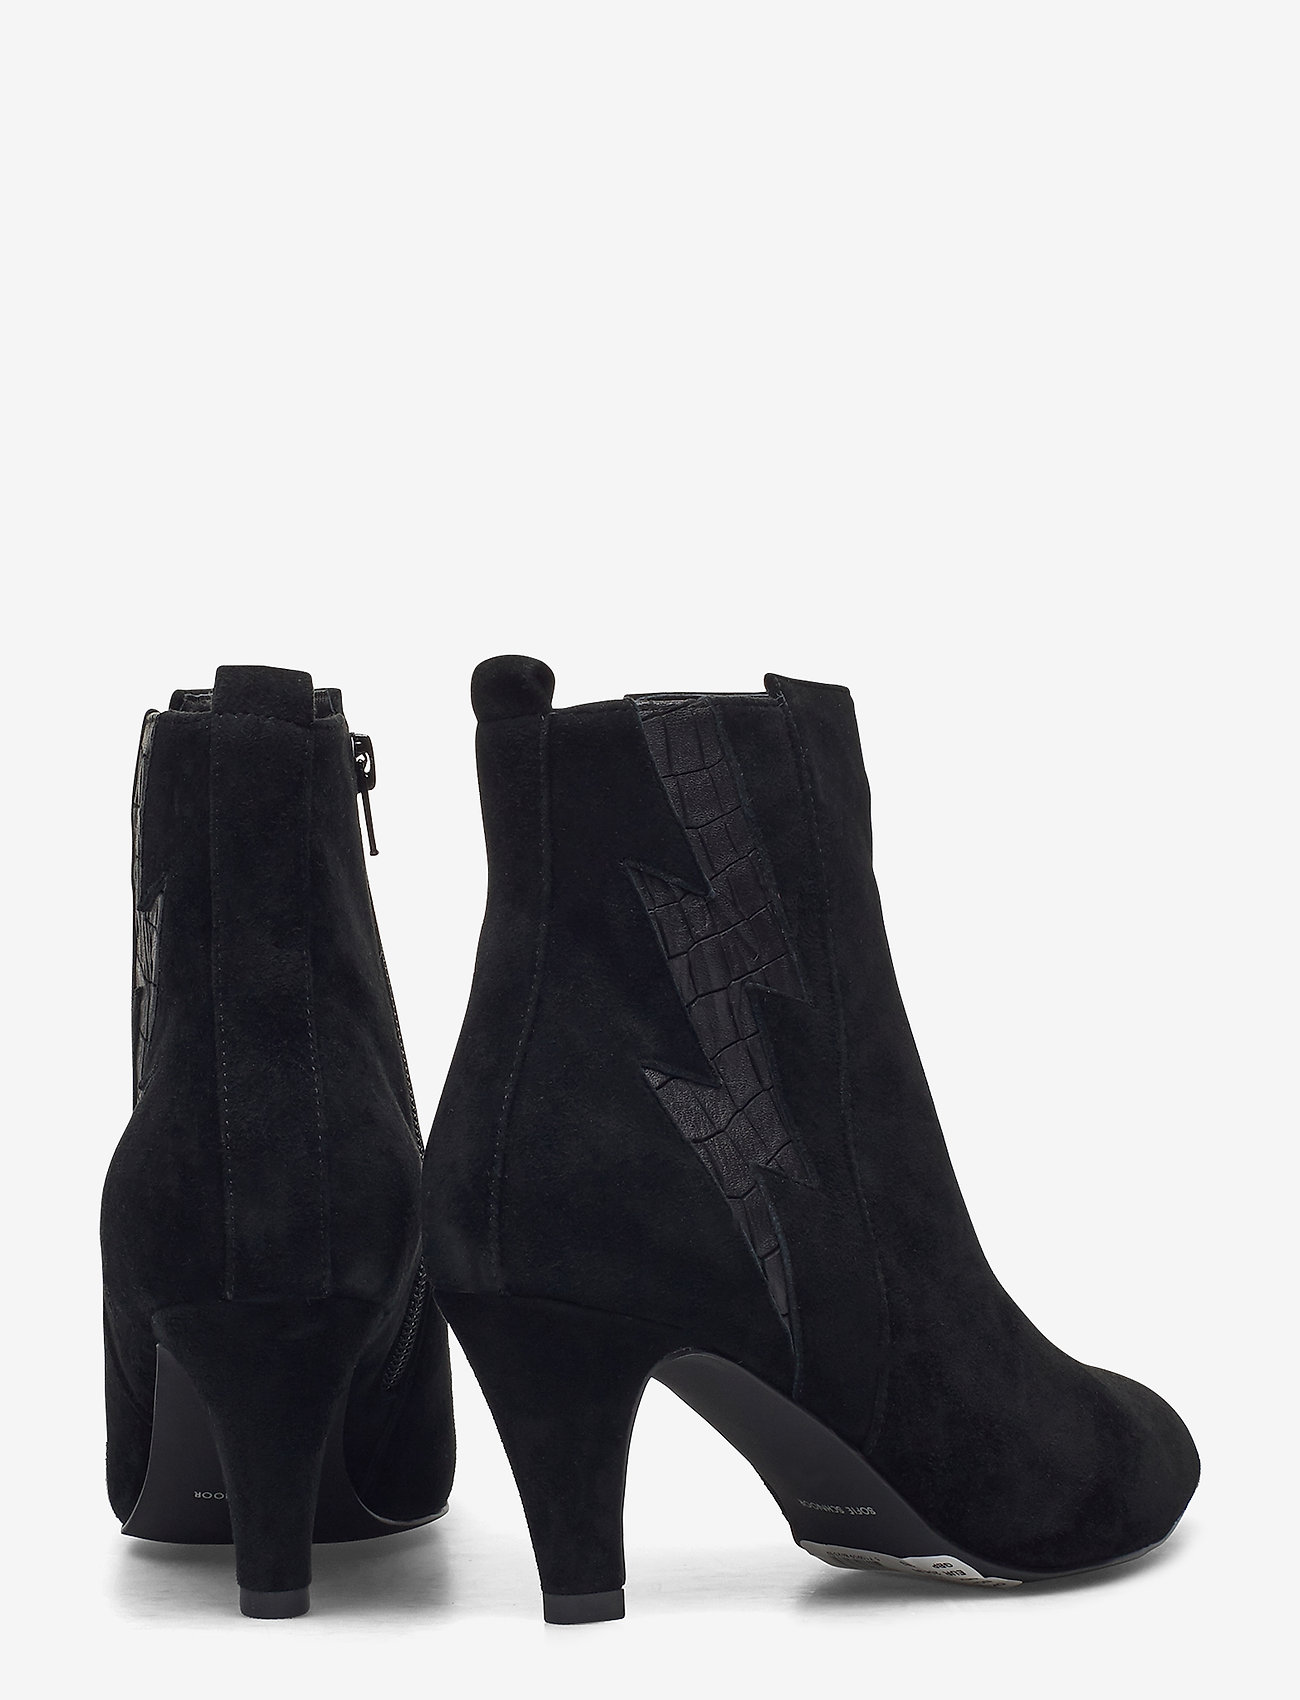 Boot 7 Cm (Black) (153.71 €) - Sofie Schnoor BW3aA